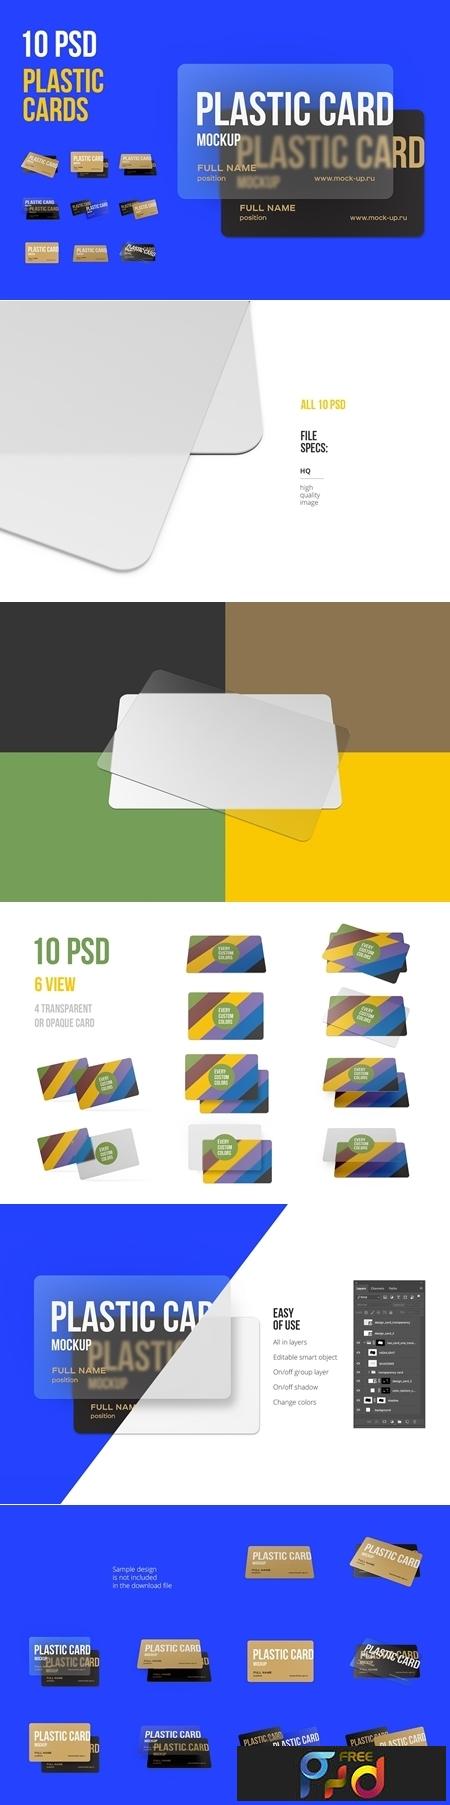 10 PSD Plastic Card mockup 3812972 1